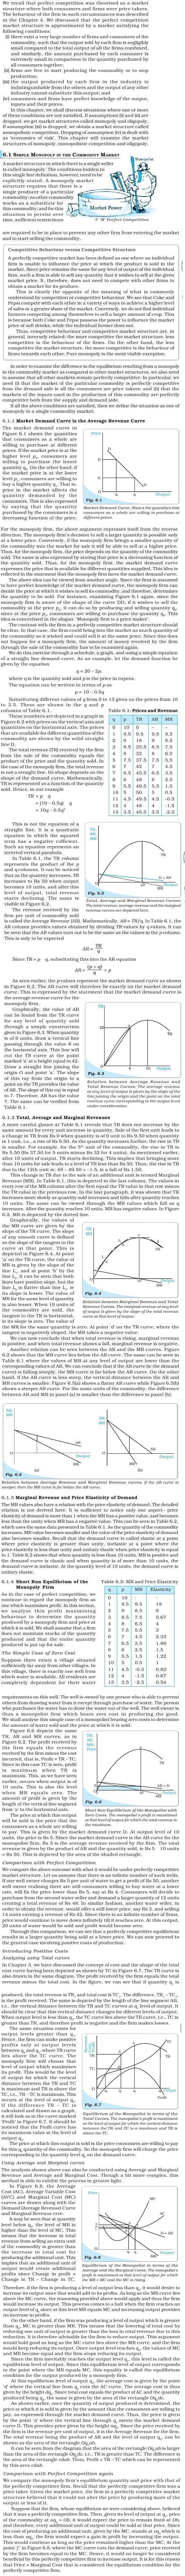 NCERT Class XII Economics Microeconomics - Non-Competitive Markets